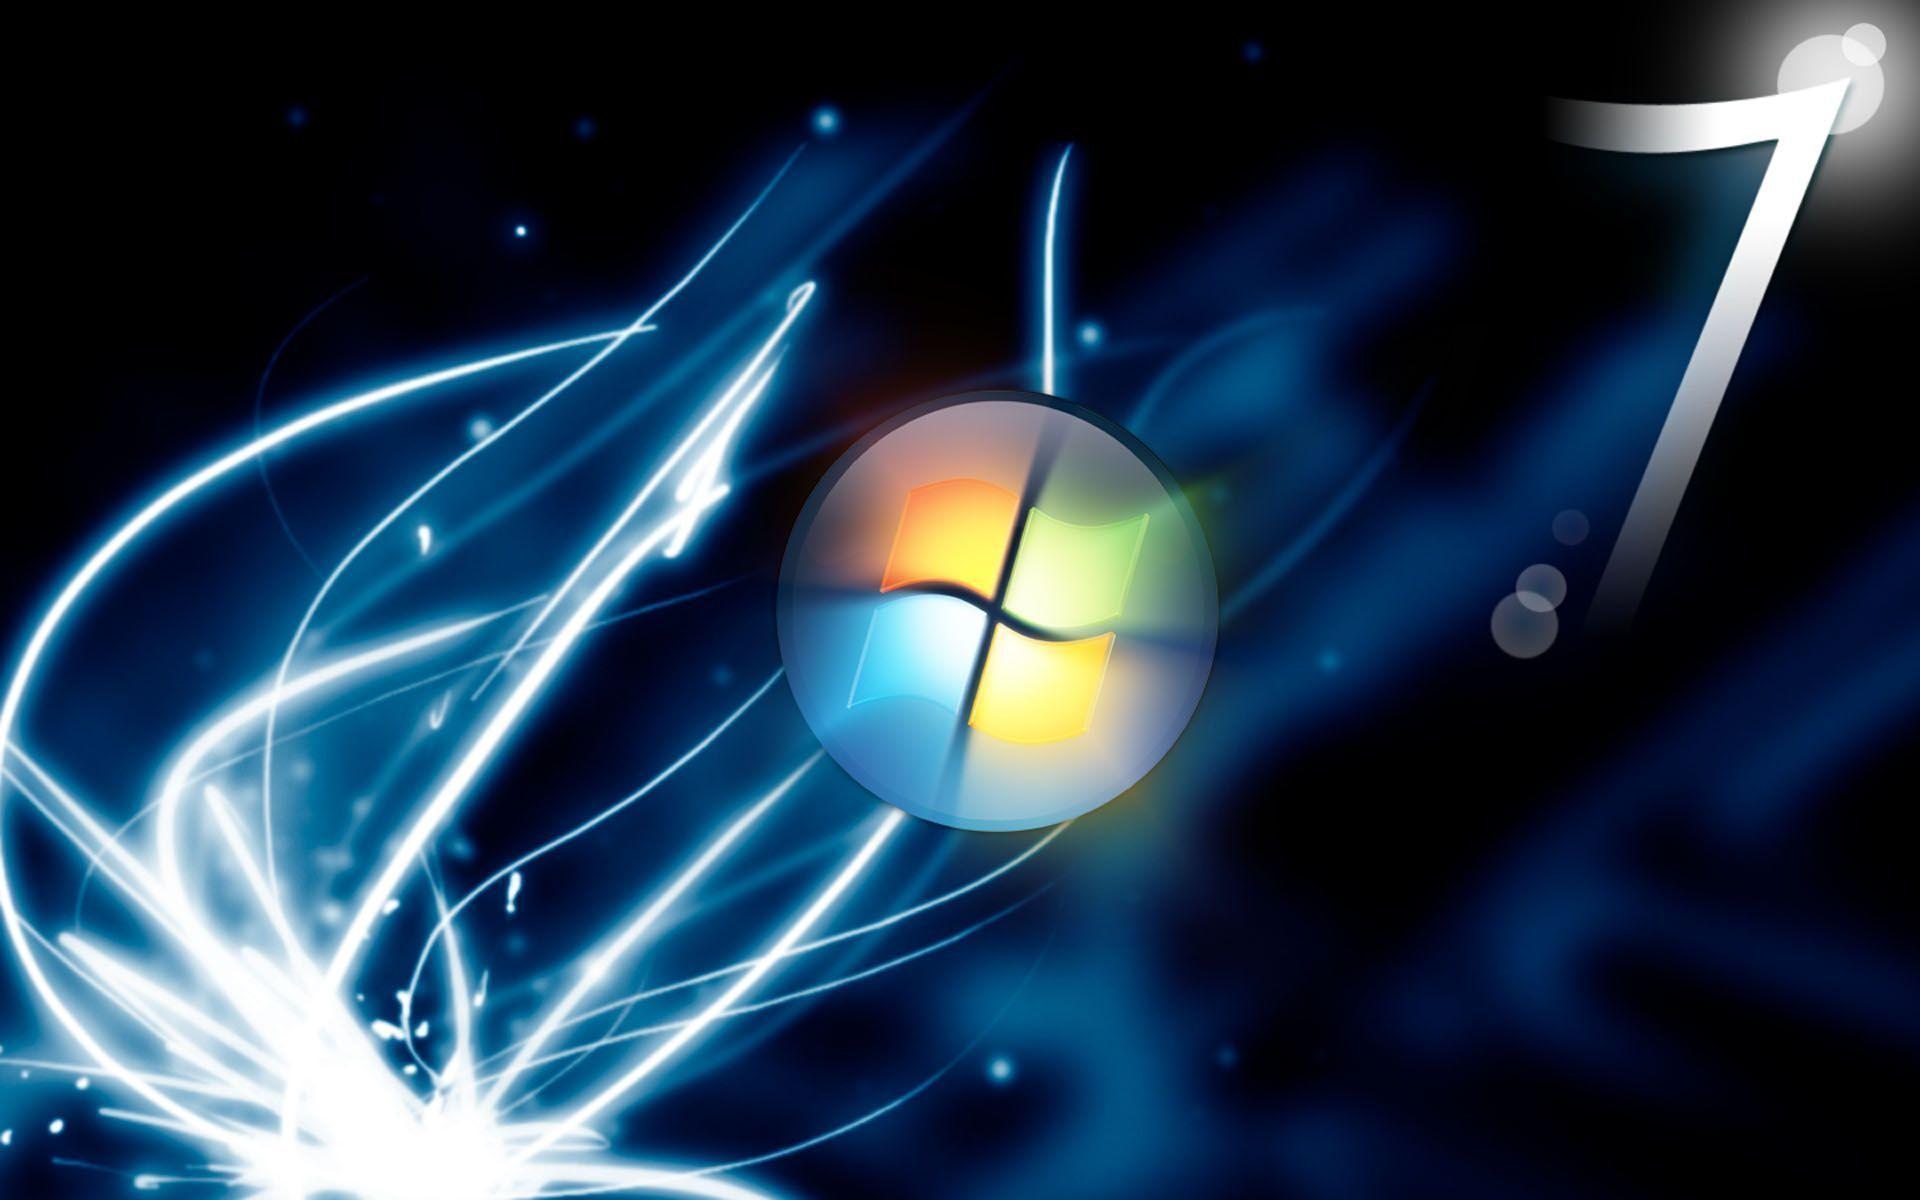 Windows 7 Ultimate Wallpaper Hd Laptop Nature Widescreen Ultimate 1920x1200